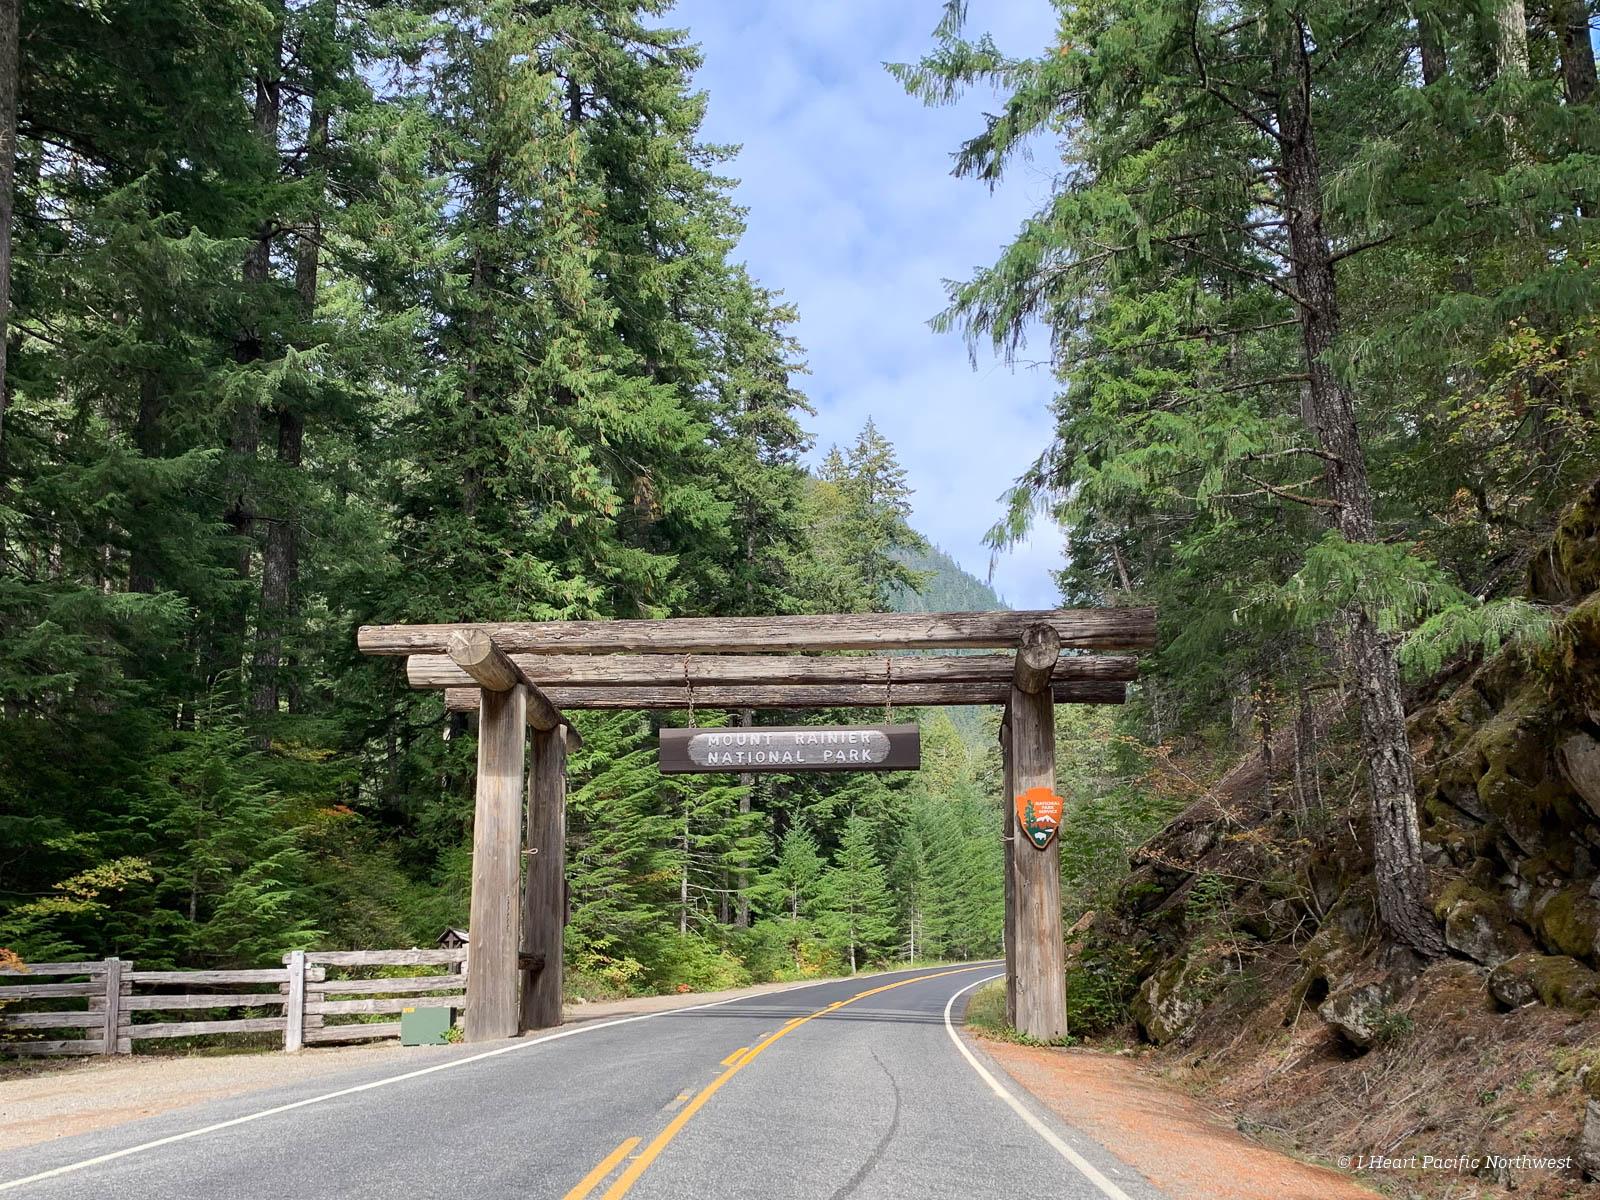 Mount Rainier National Park - Ohanapecosh camping trip